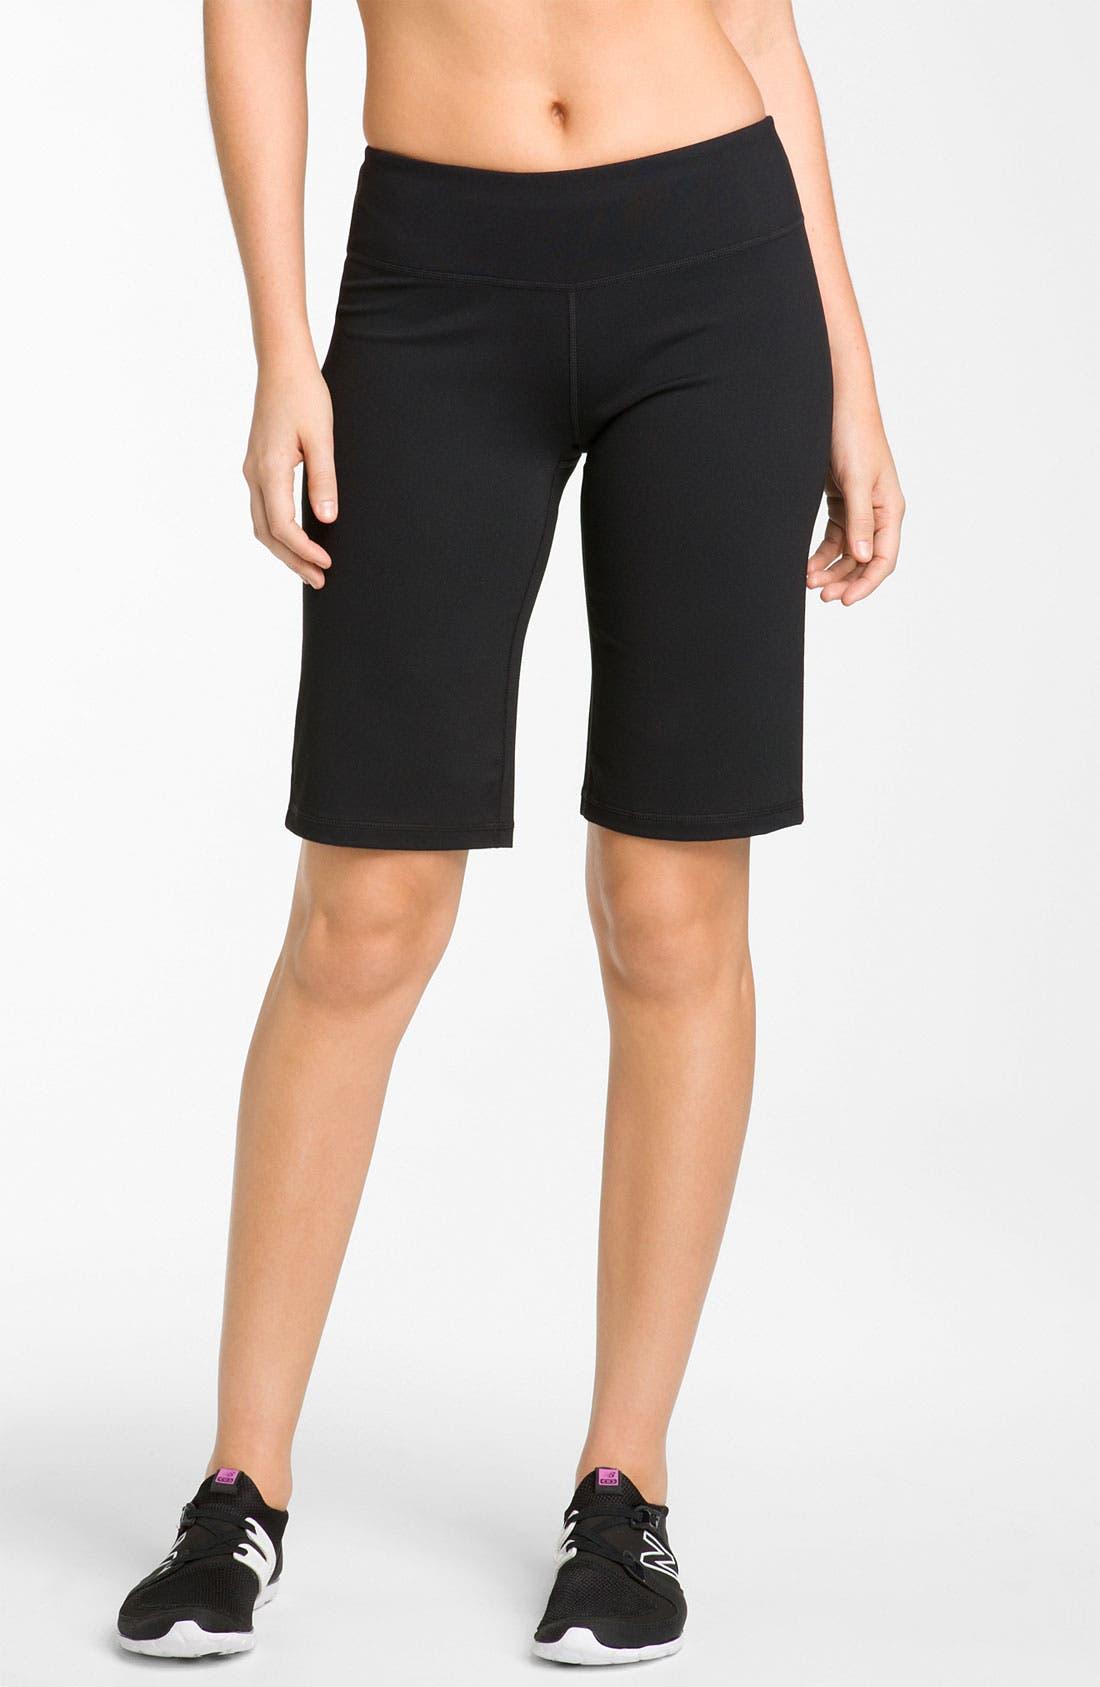 Main Image - Zella 'Balance 2' Shorts